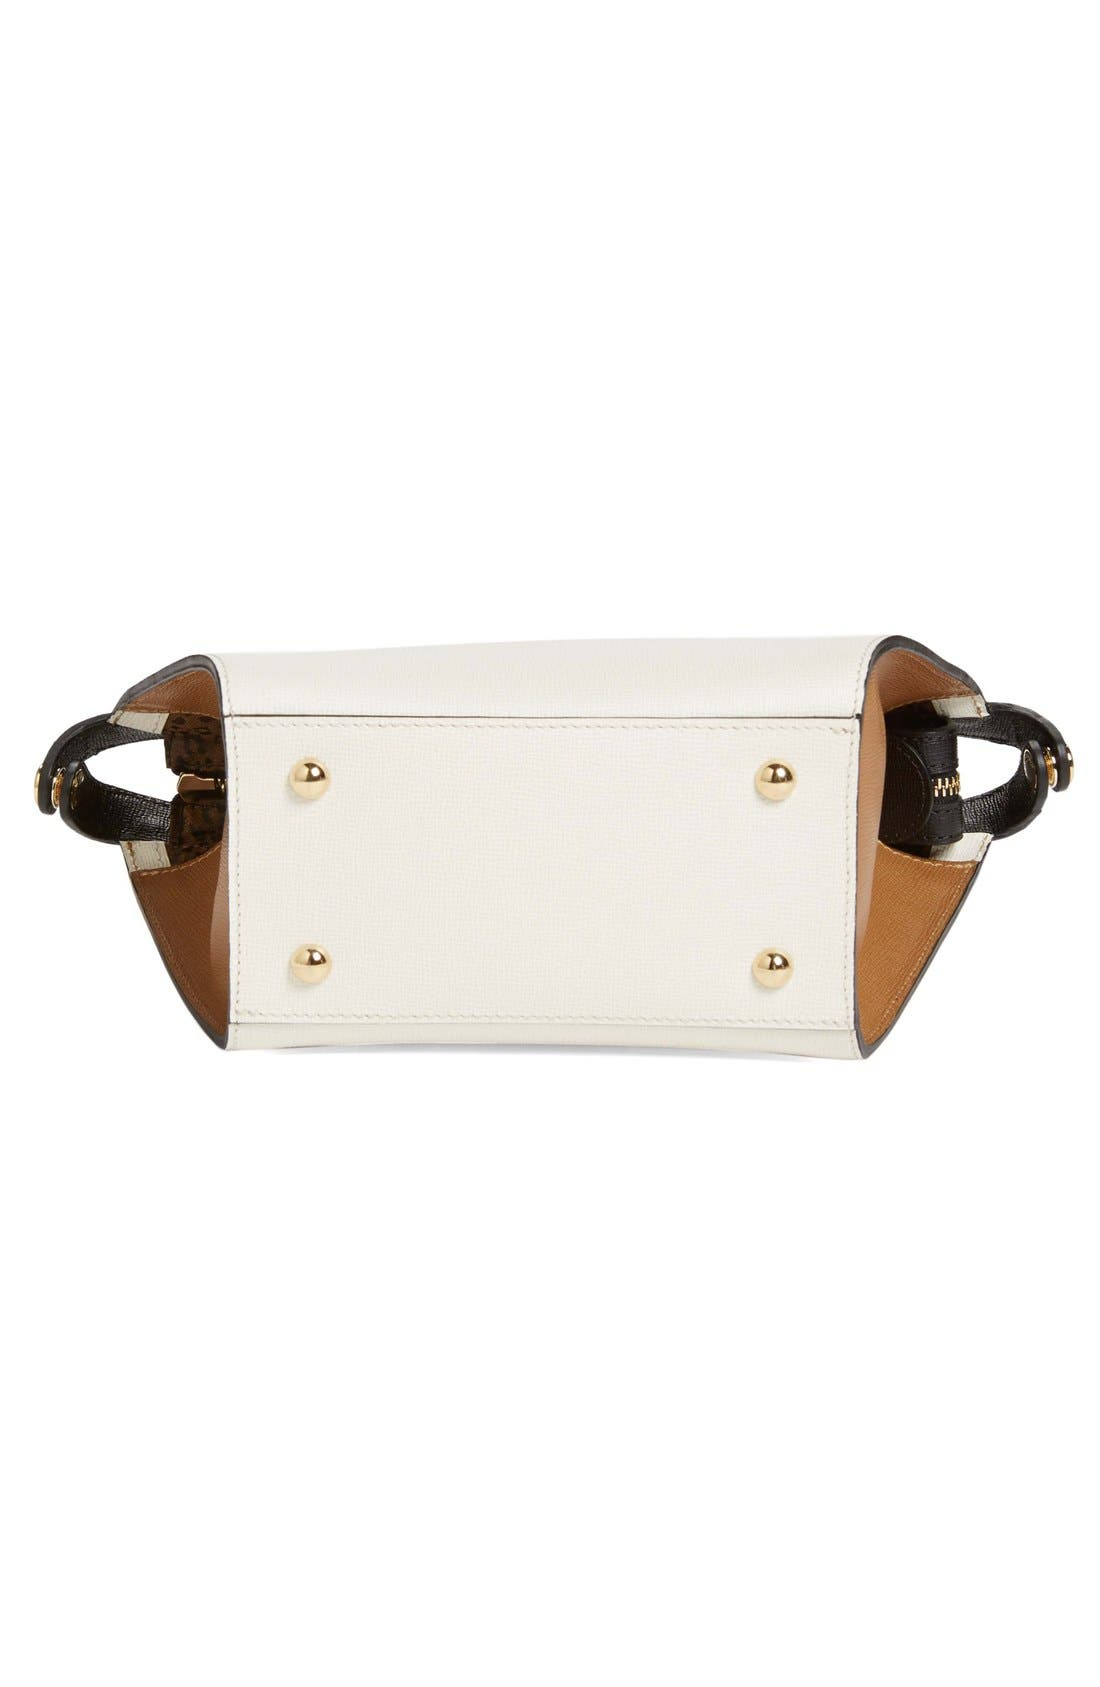 'Small Le Pliage - Heritage' Leather Handbag,                             Alternate thumbnail 4, color,                             100